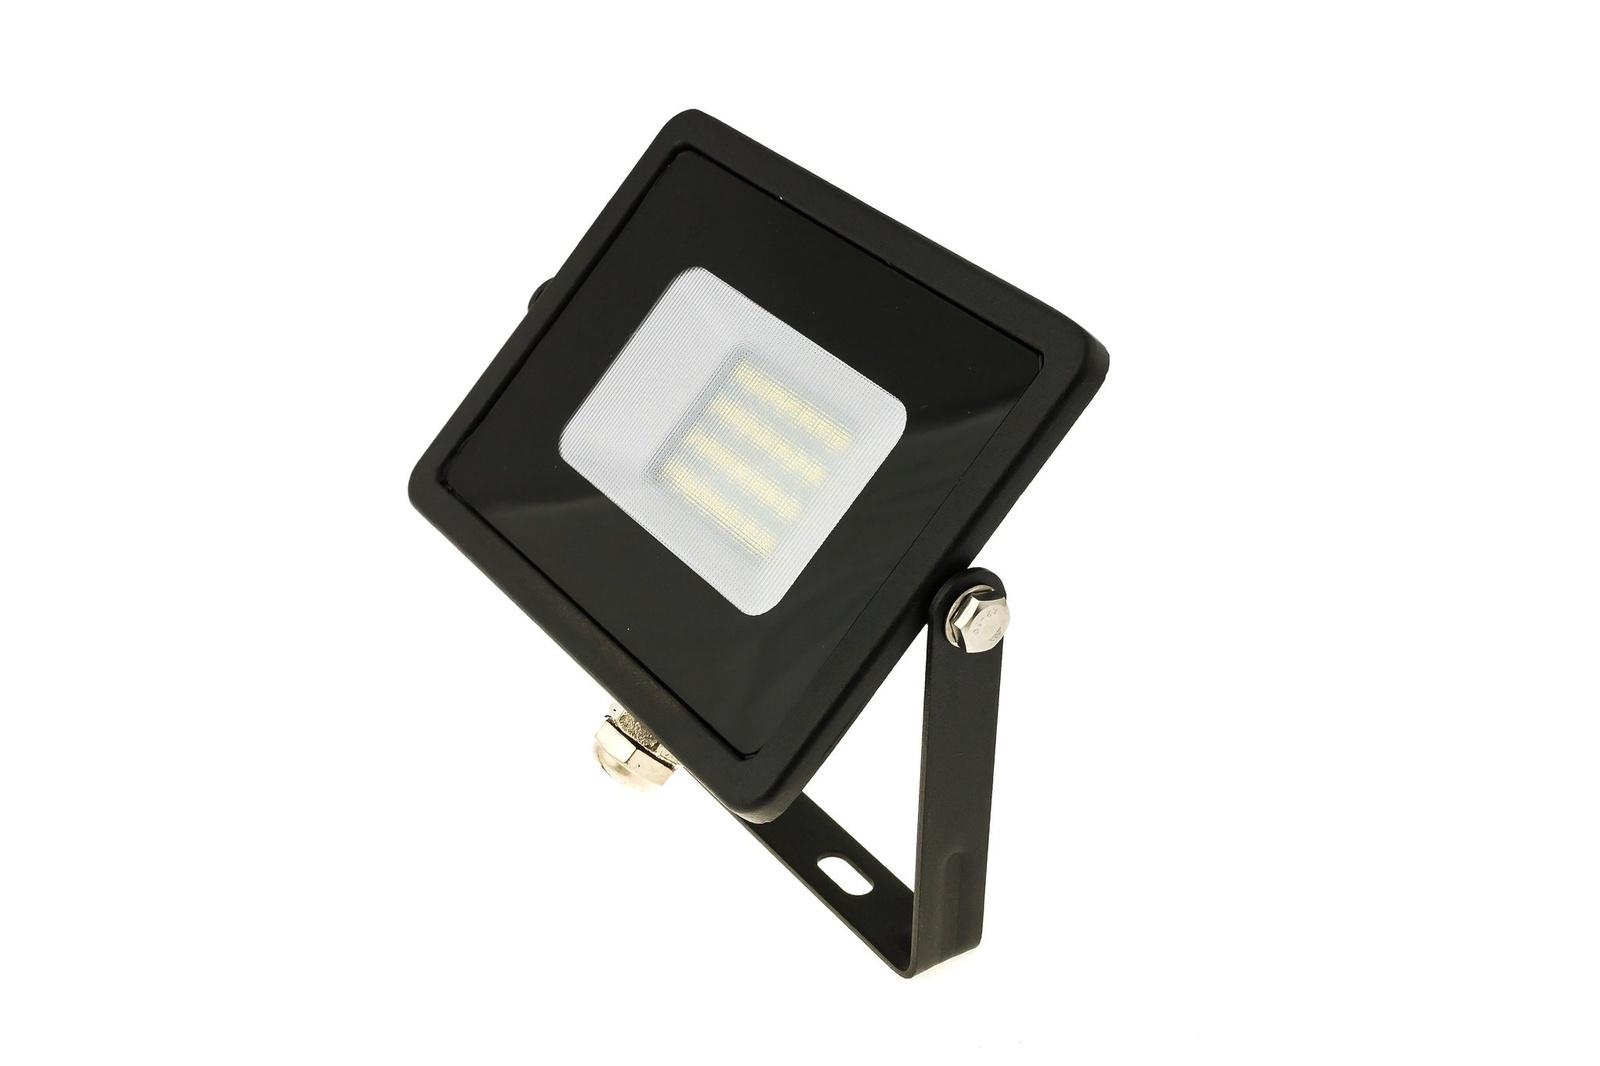 Прожектор Feron Светодиодный прожектор Feron LL-920 черный, 30 Вт светодиодный прожектор ip65 50w желтый feron ll 275 12204